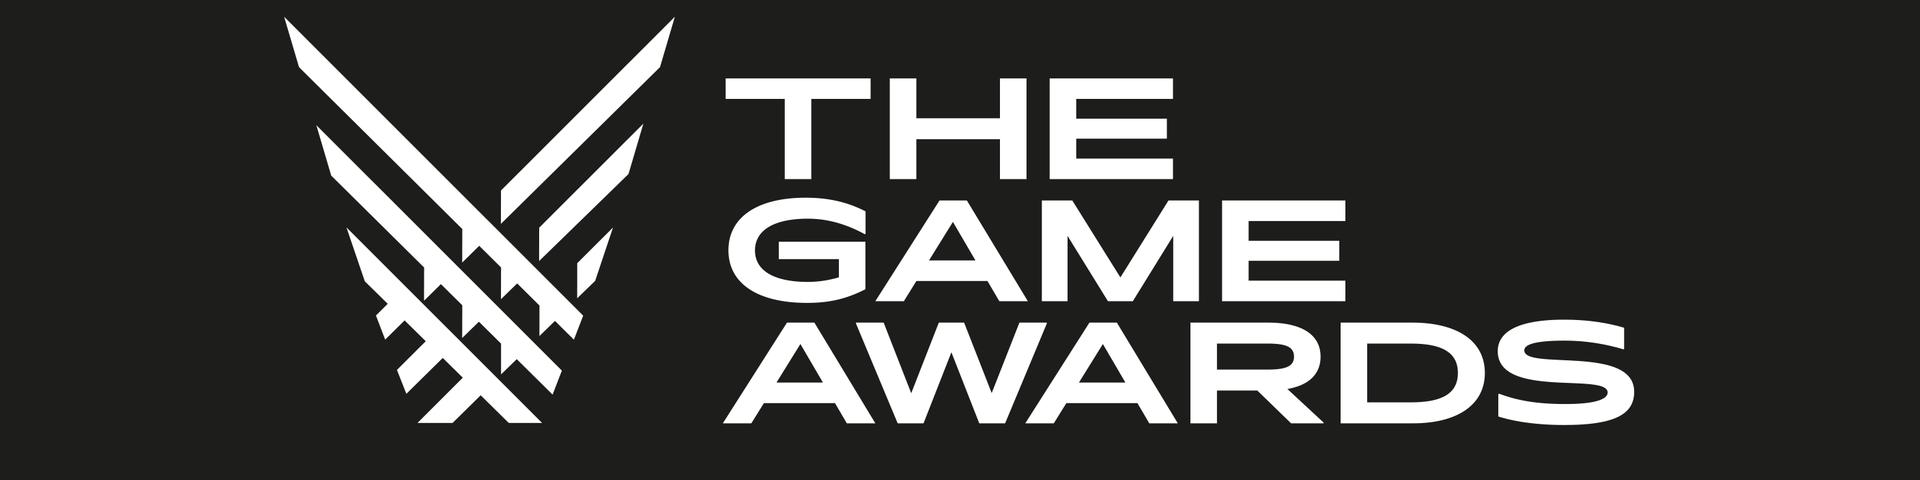 The Game Awards Logo Header.png